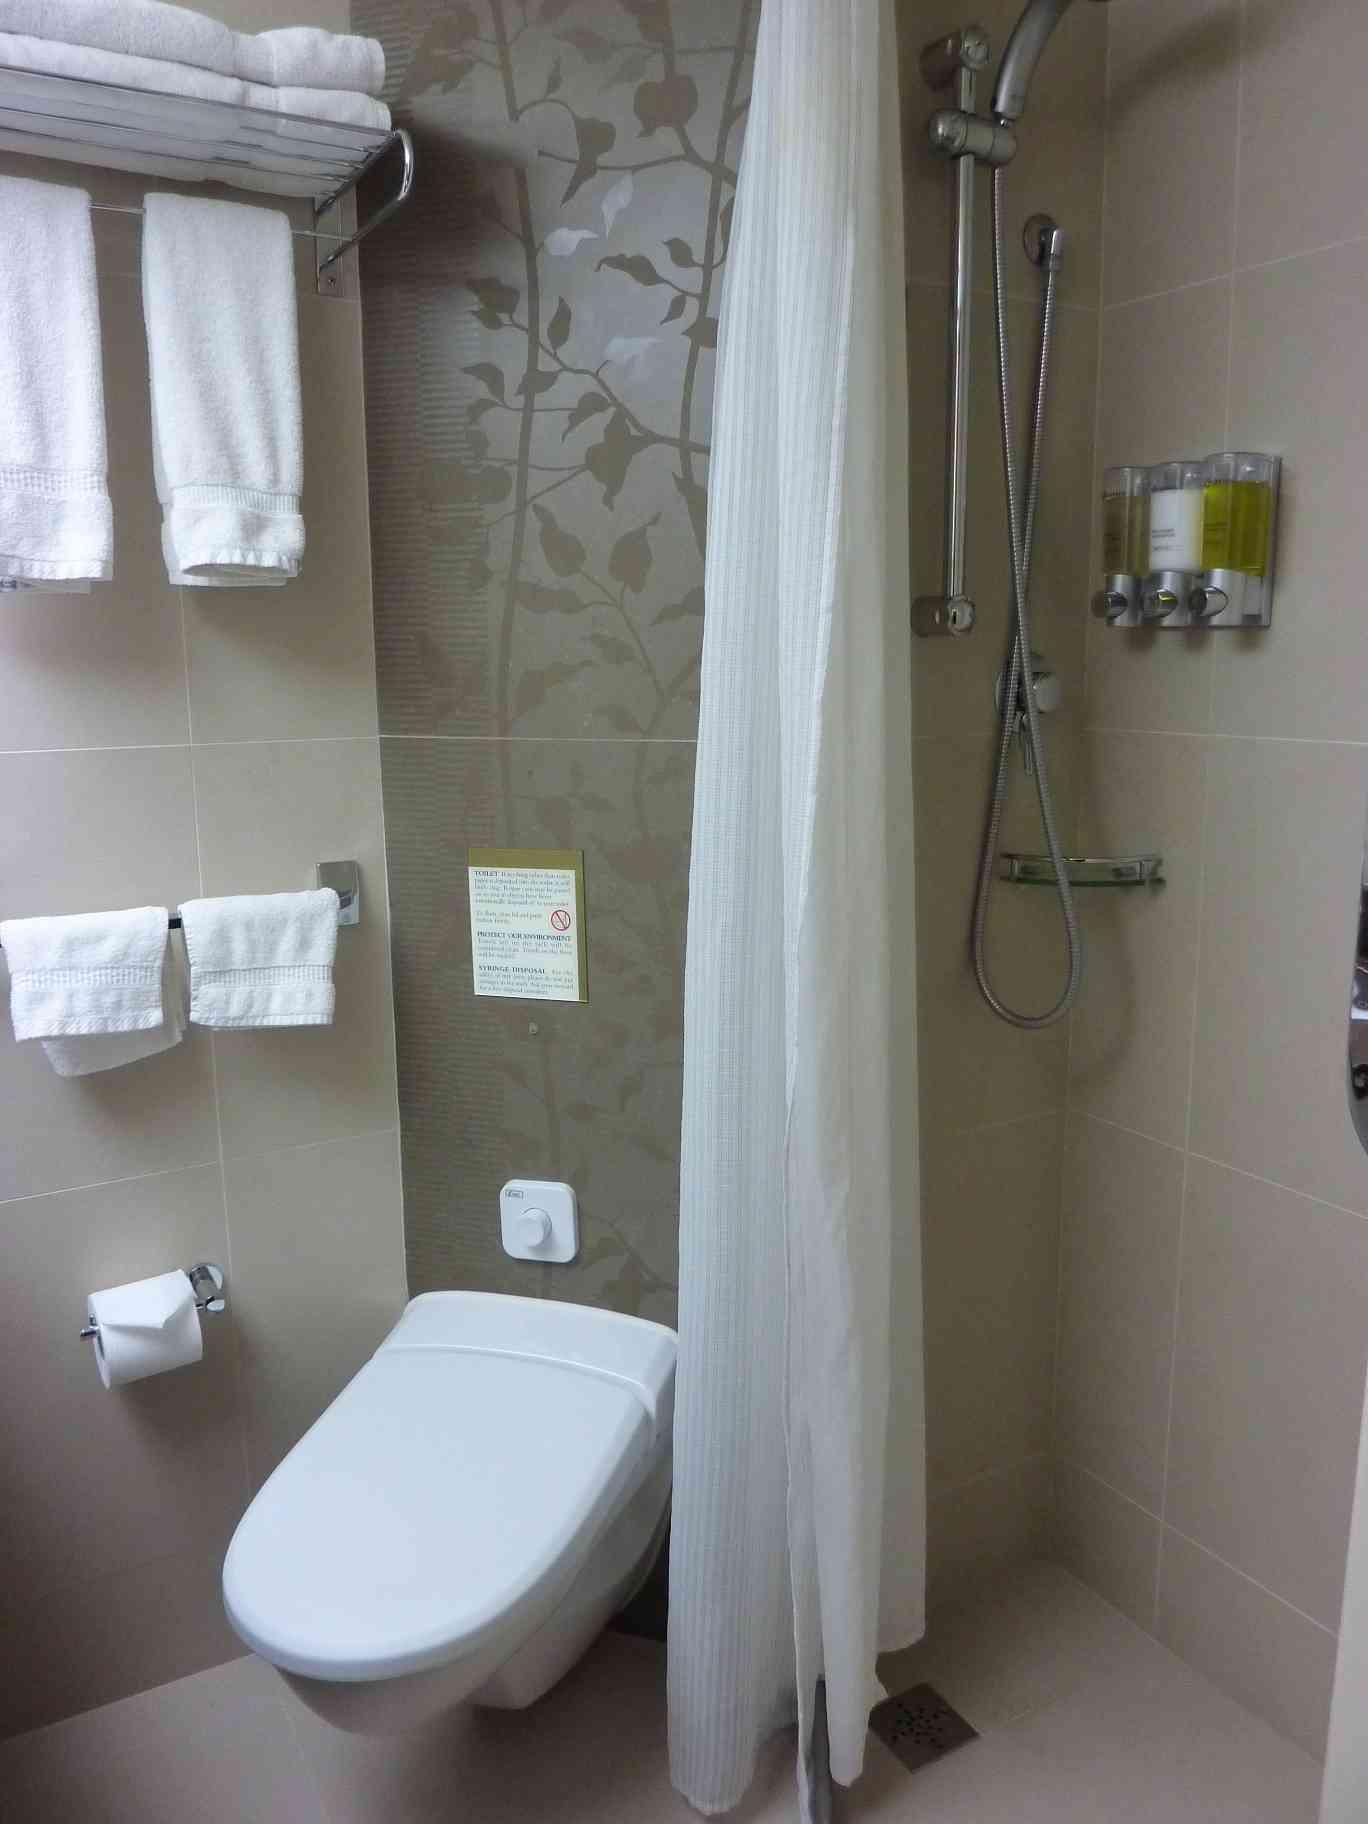 Januari 2012 cruisereiziger - Kleine badkamer wc ...